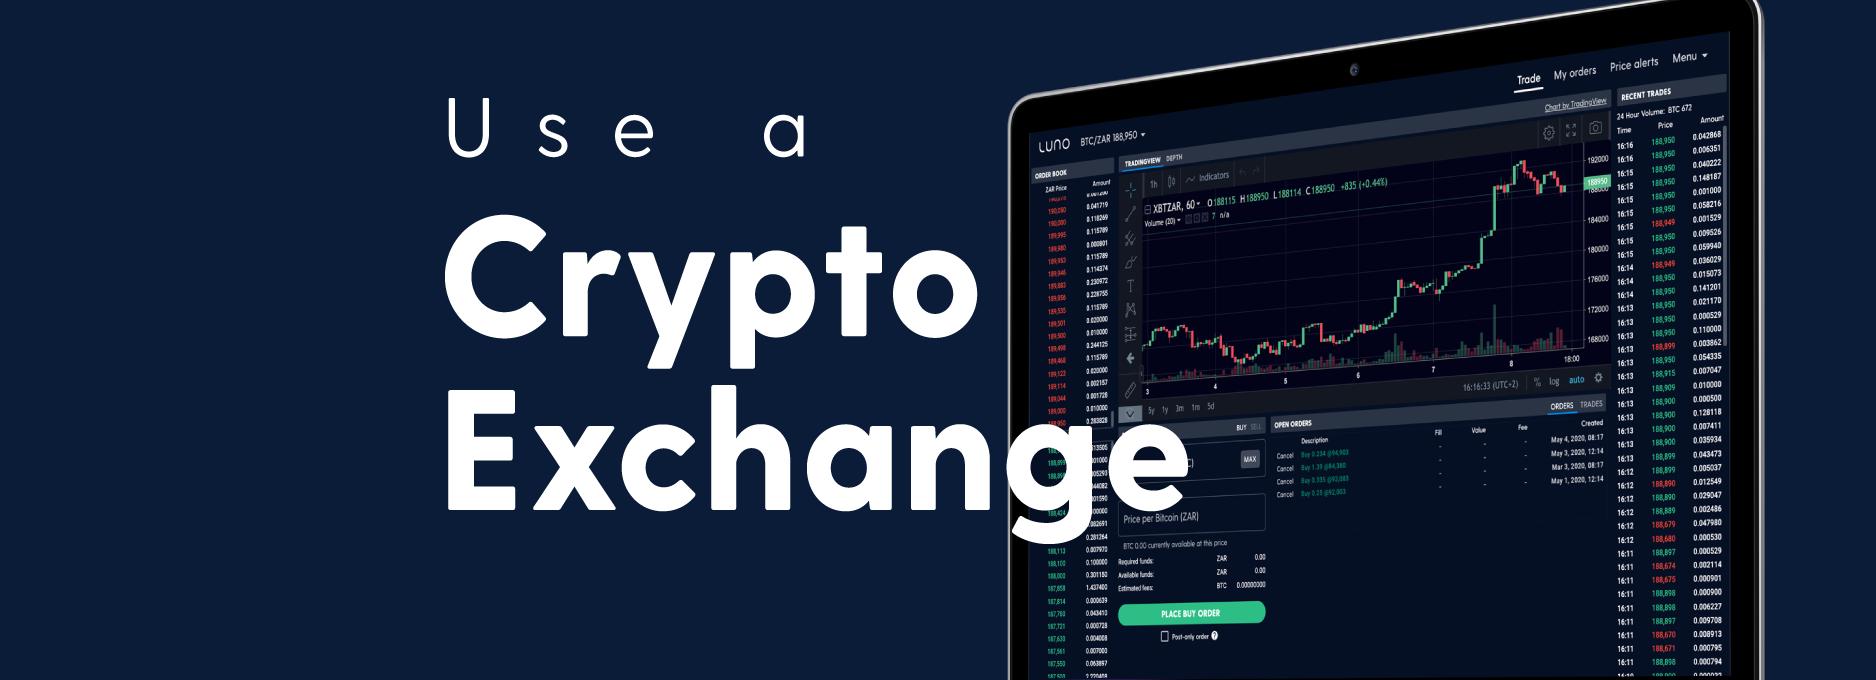 Crypto pro trader ekşi